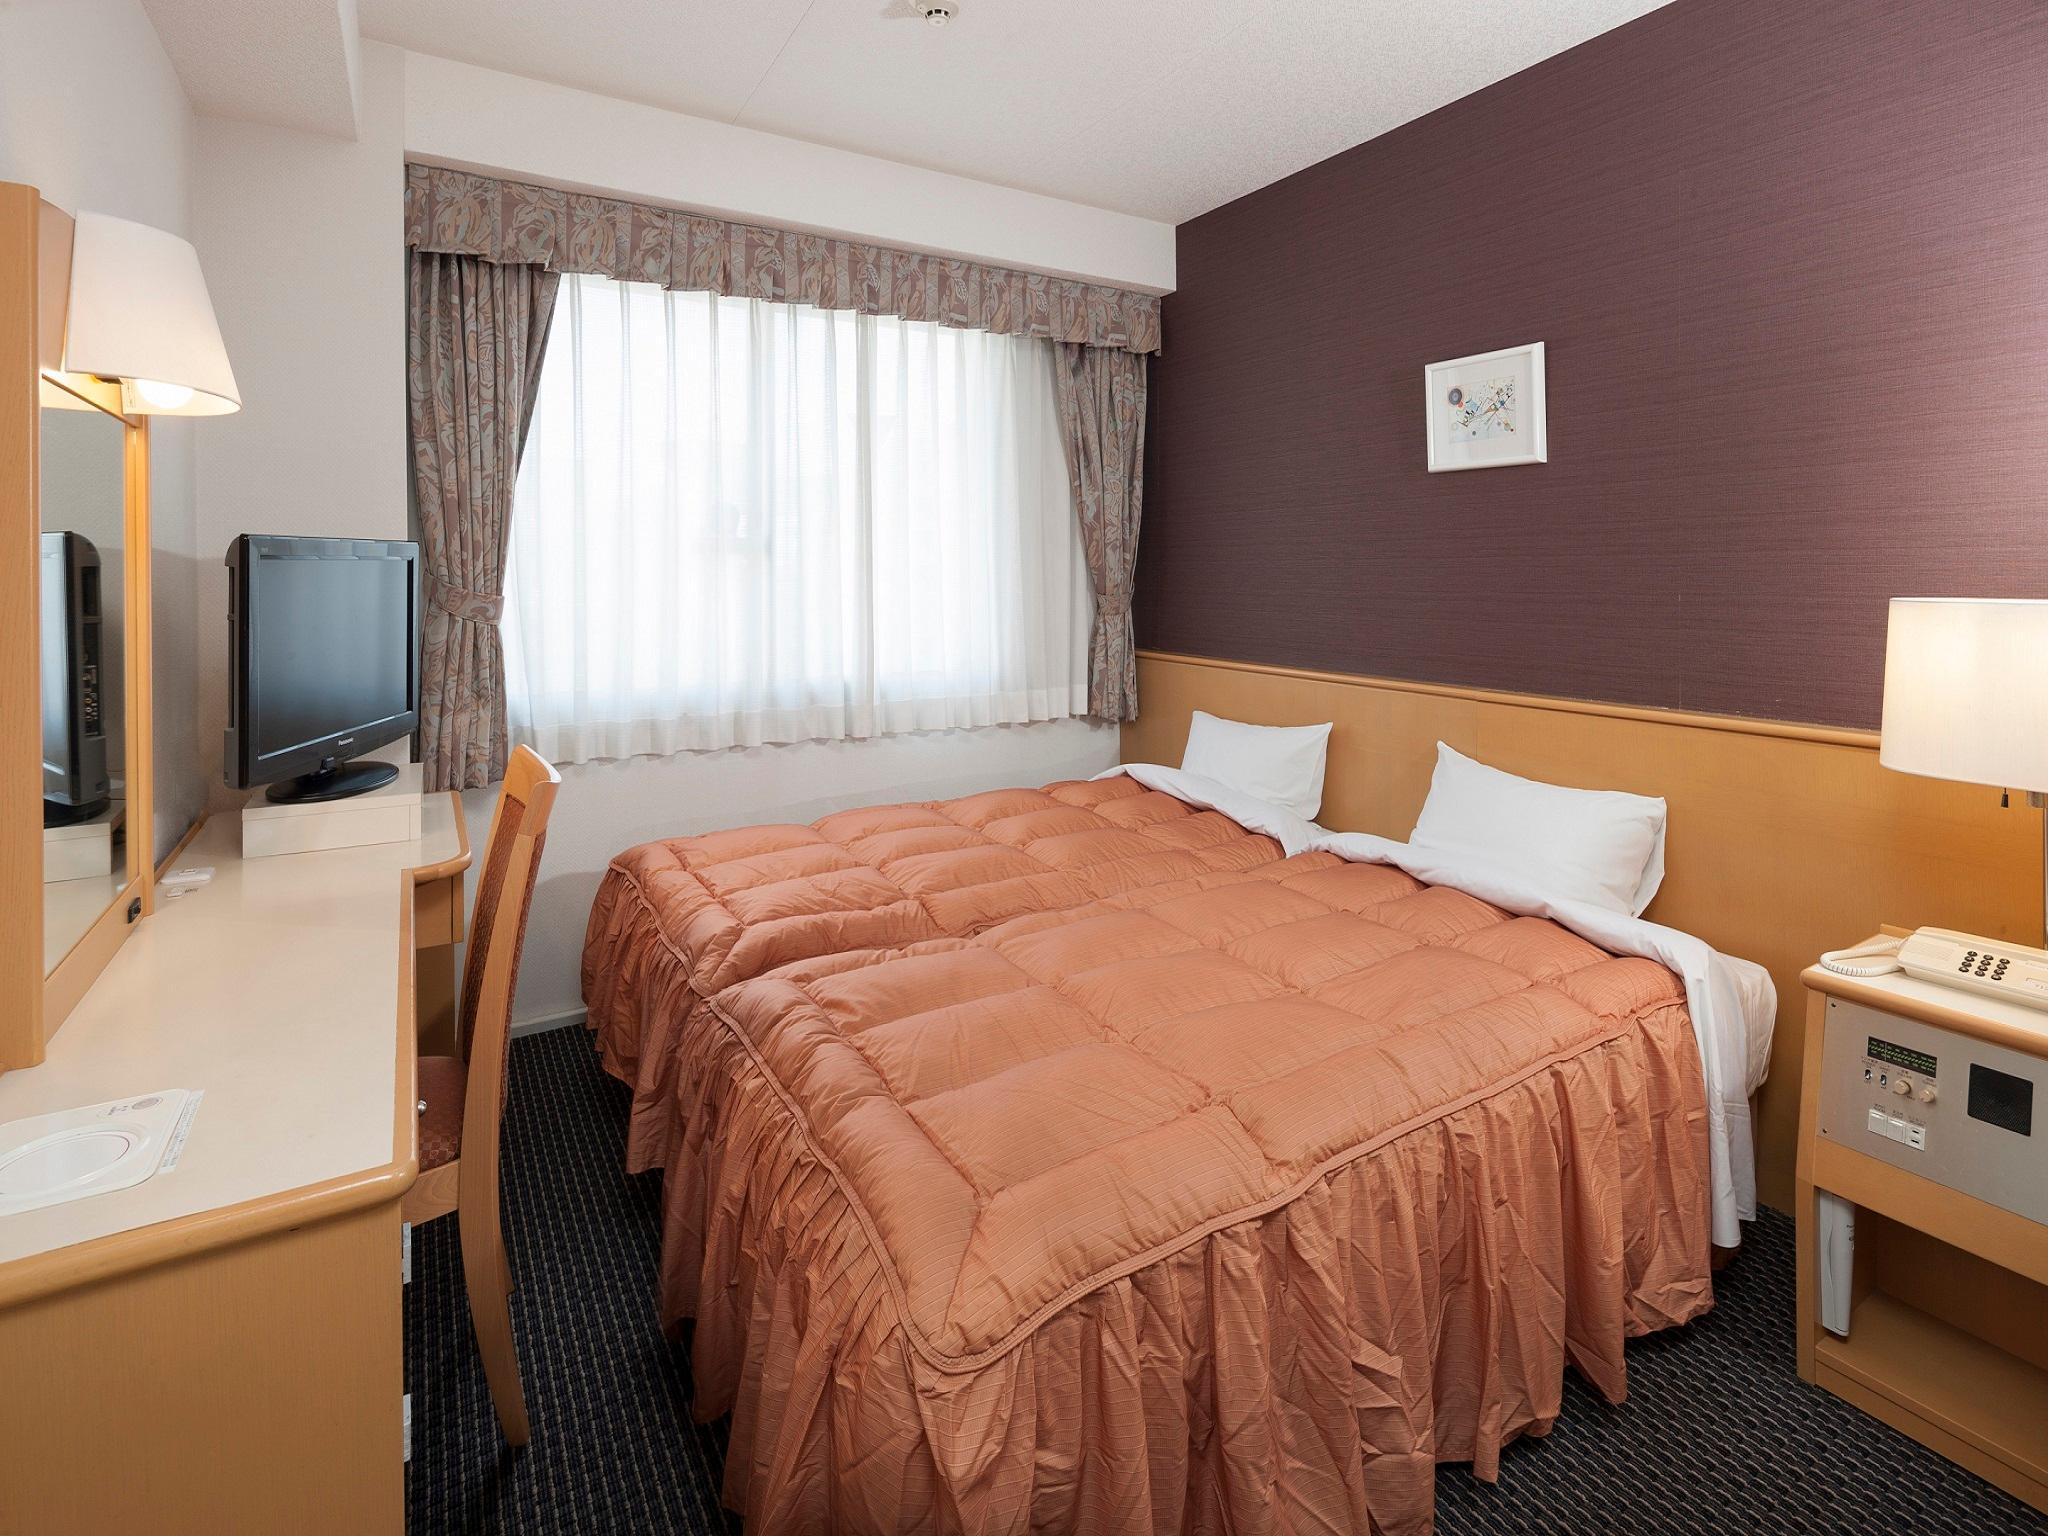 Kyoto Tower Hotel Annex Reviews